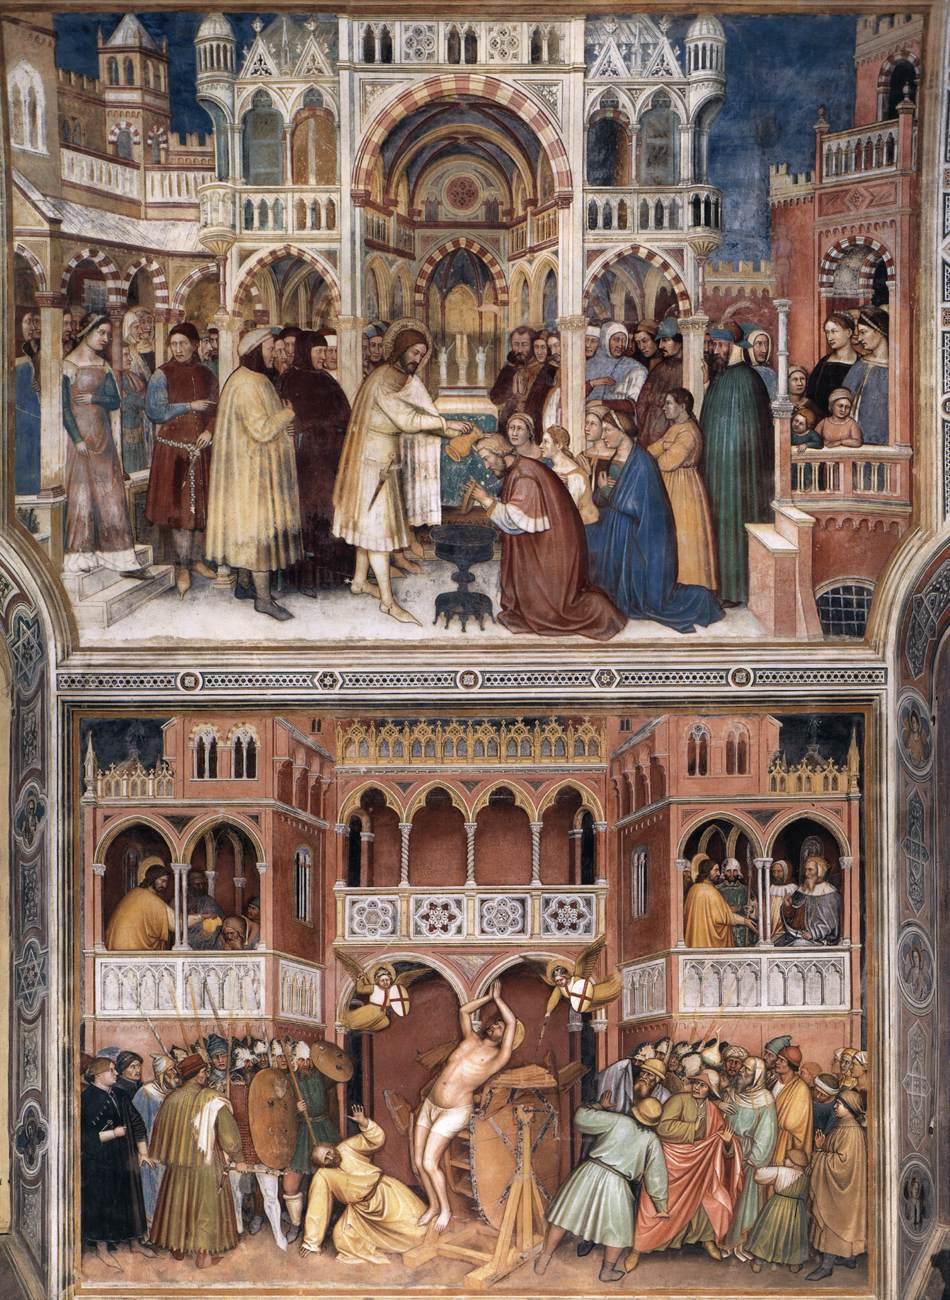 Altichiero da Zevio, 1378-84, Fresco, Oratorio di San Giorgio, Padua